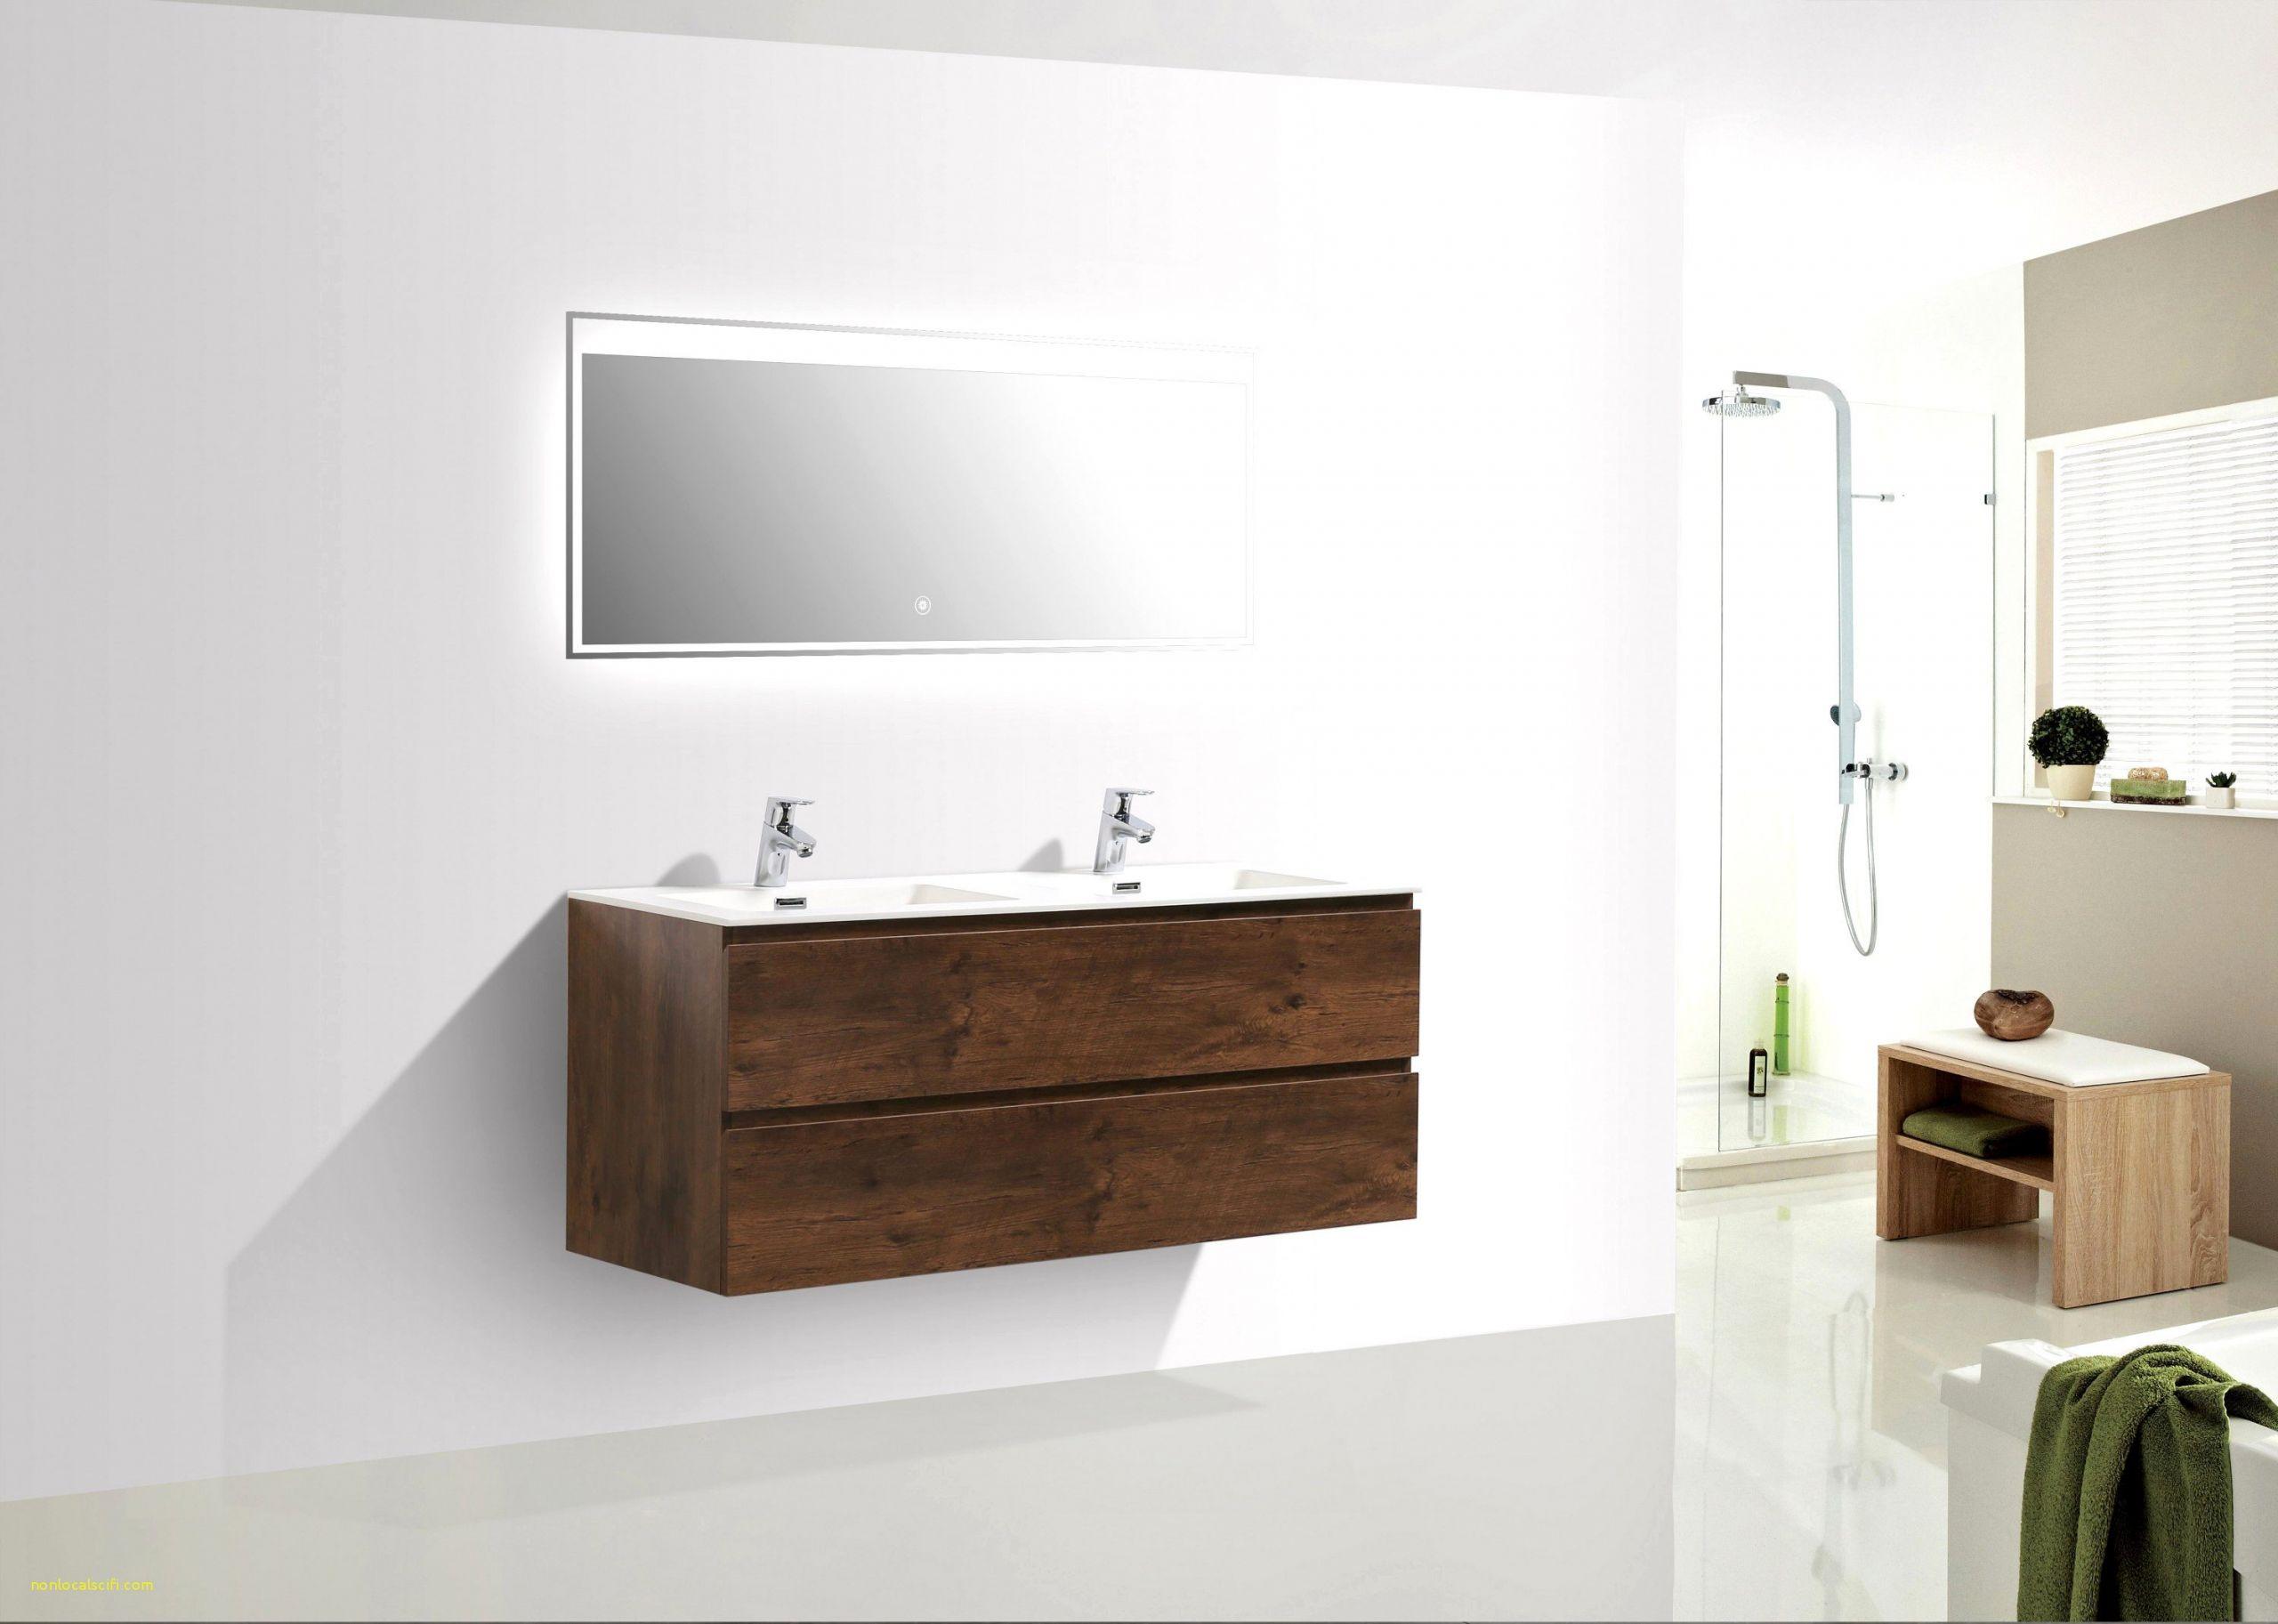 meuble salle de bain 75 cm charmant meuble sous vasque salle de bain 60 cm meuble vasque faible de meuble salle de bain 75 cm